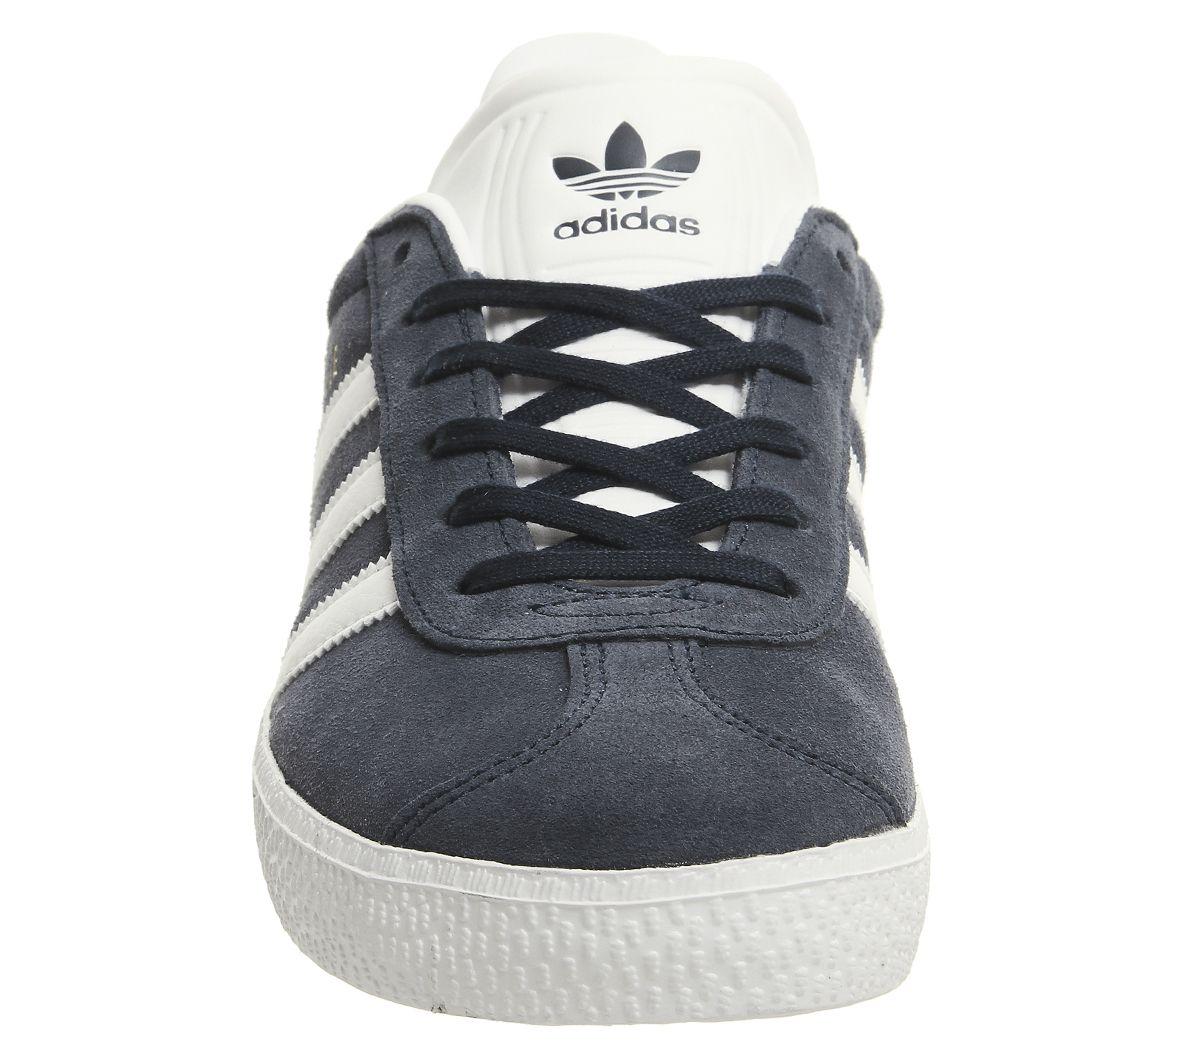 cf5aca3e6de CENTINELA Mujeres Adidas Gazelle Jr. instructores universitarios formadores  Marina zapatos